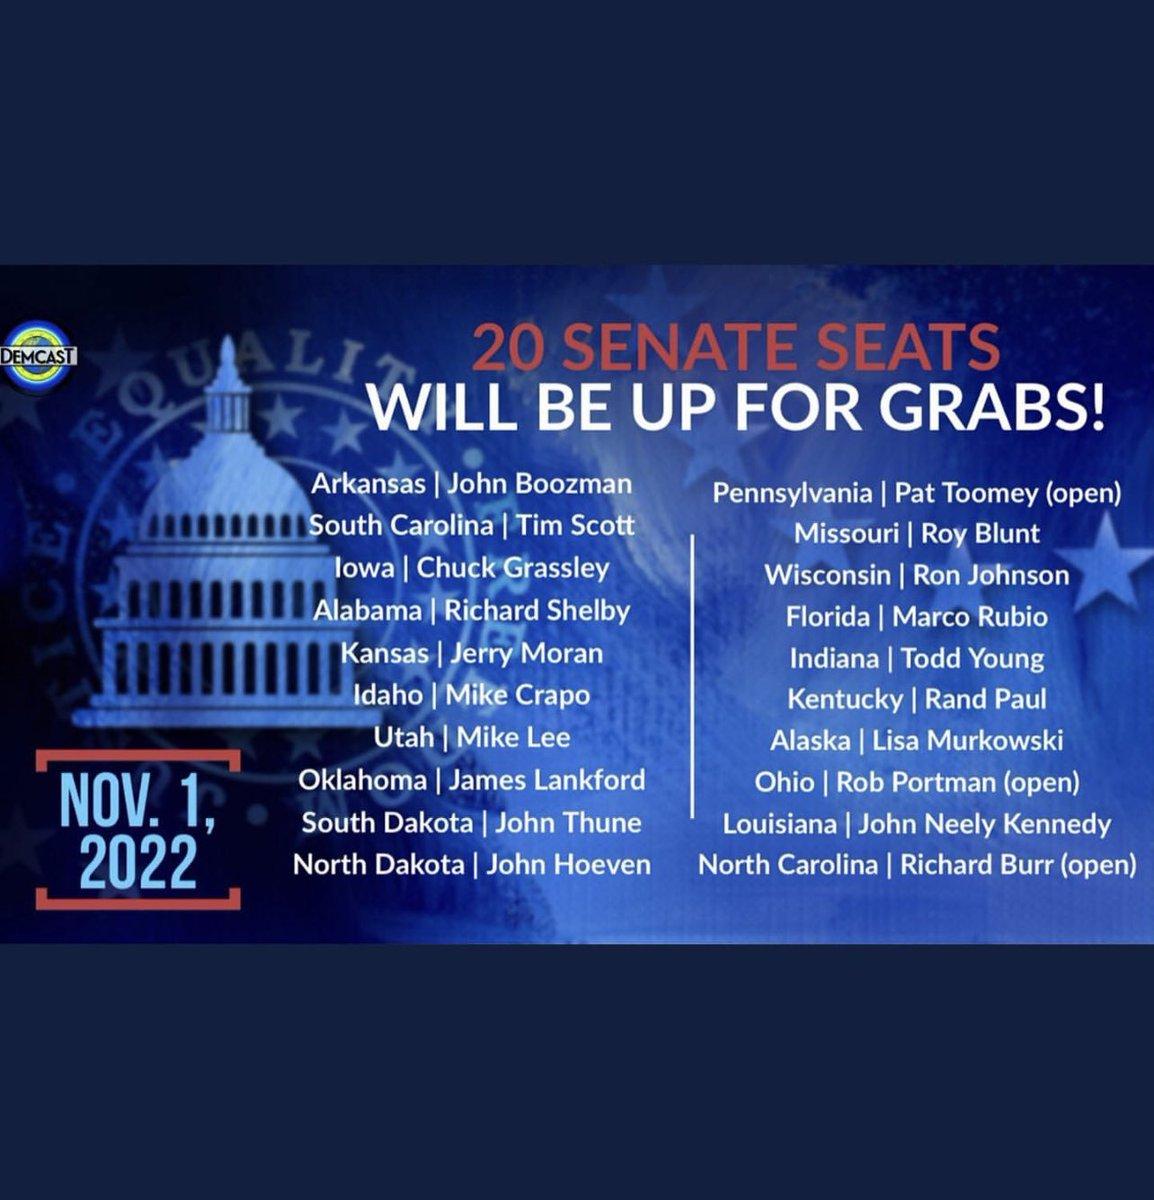 I'm looking forward to supporting the Democrats that run against these 20 GOP Senators in 2022! #faithwithoutworkisdead #TraitorsSupportTraitorTrump #BidenTakeAction #BidenHarris #AmericaOrTrump https://t.co/TU5QLdrgbV